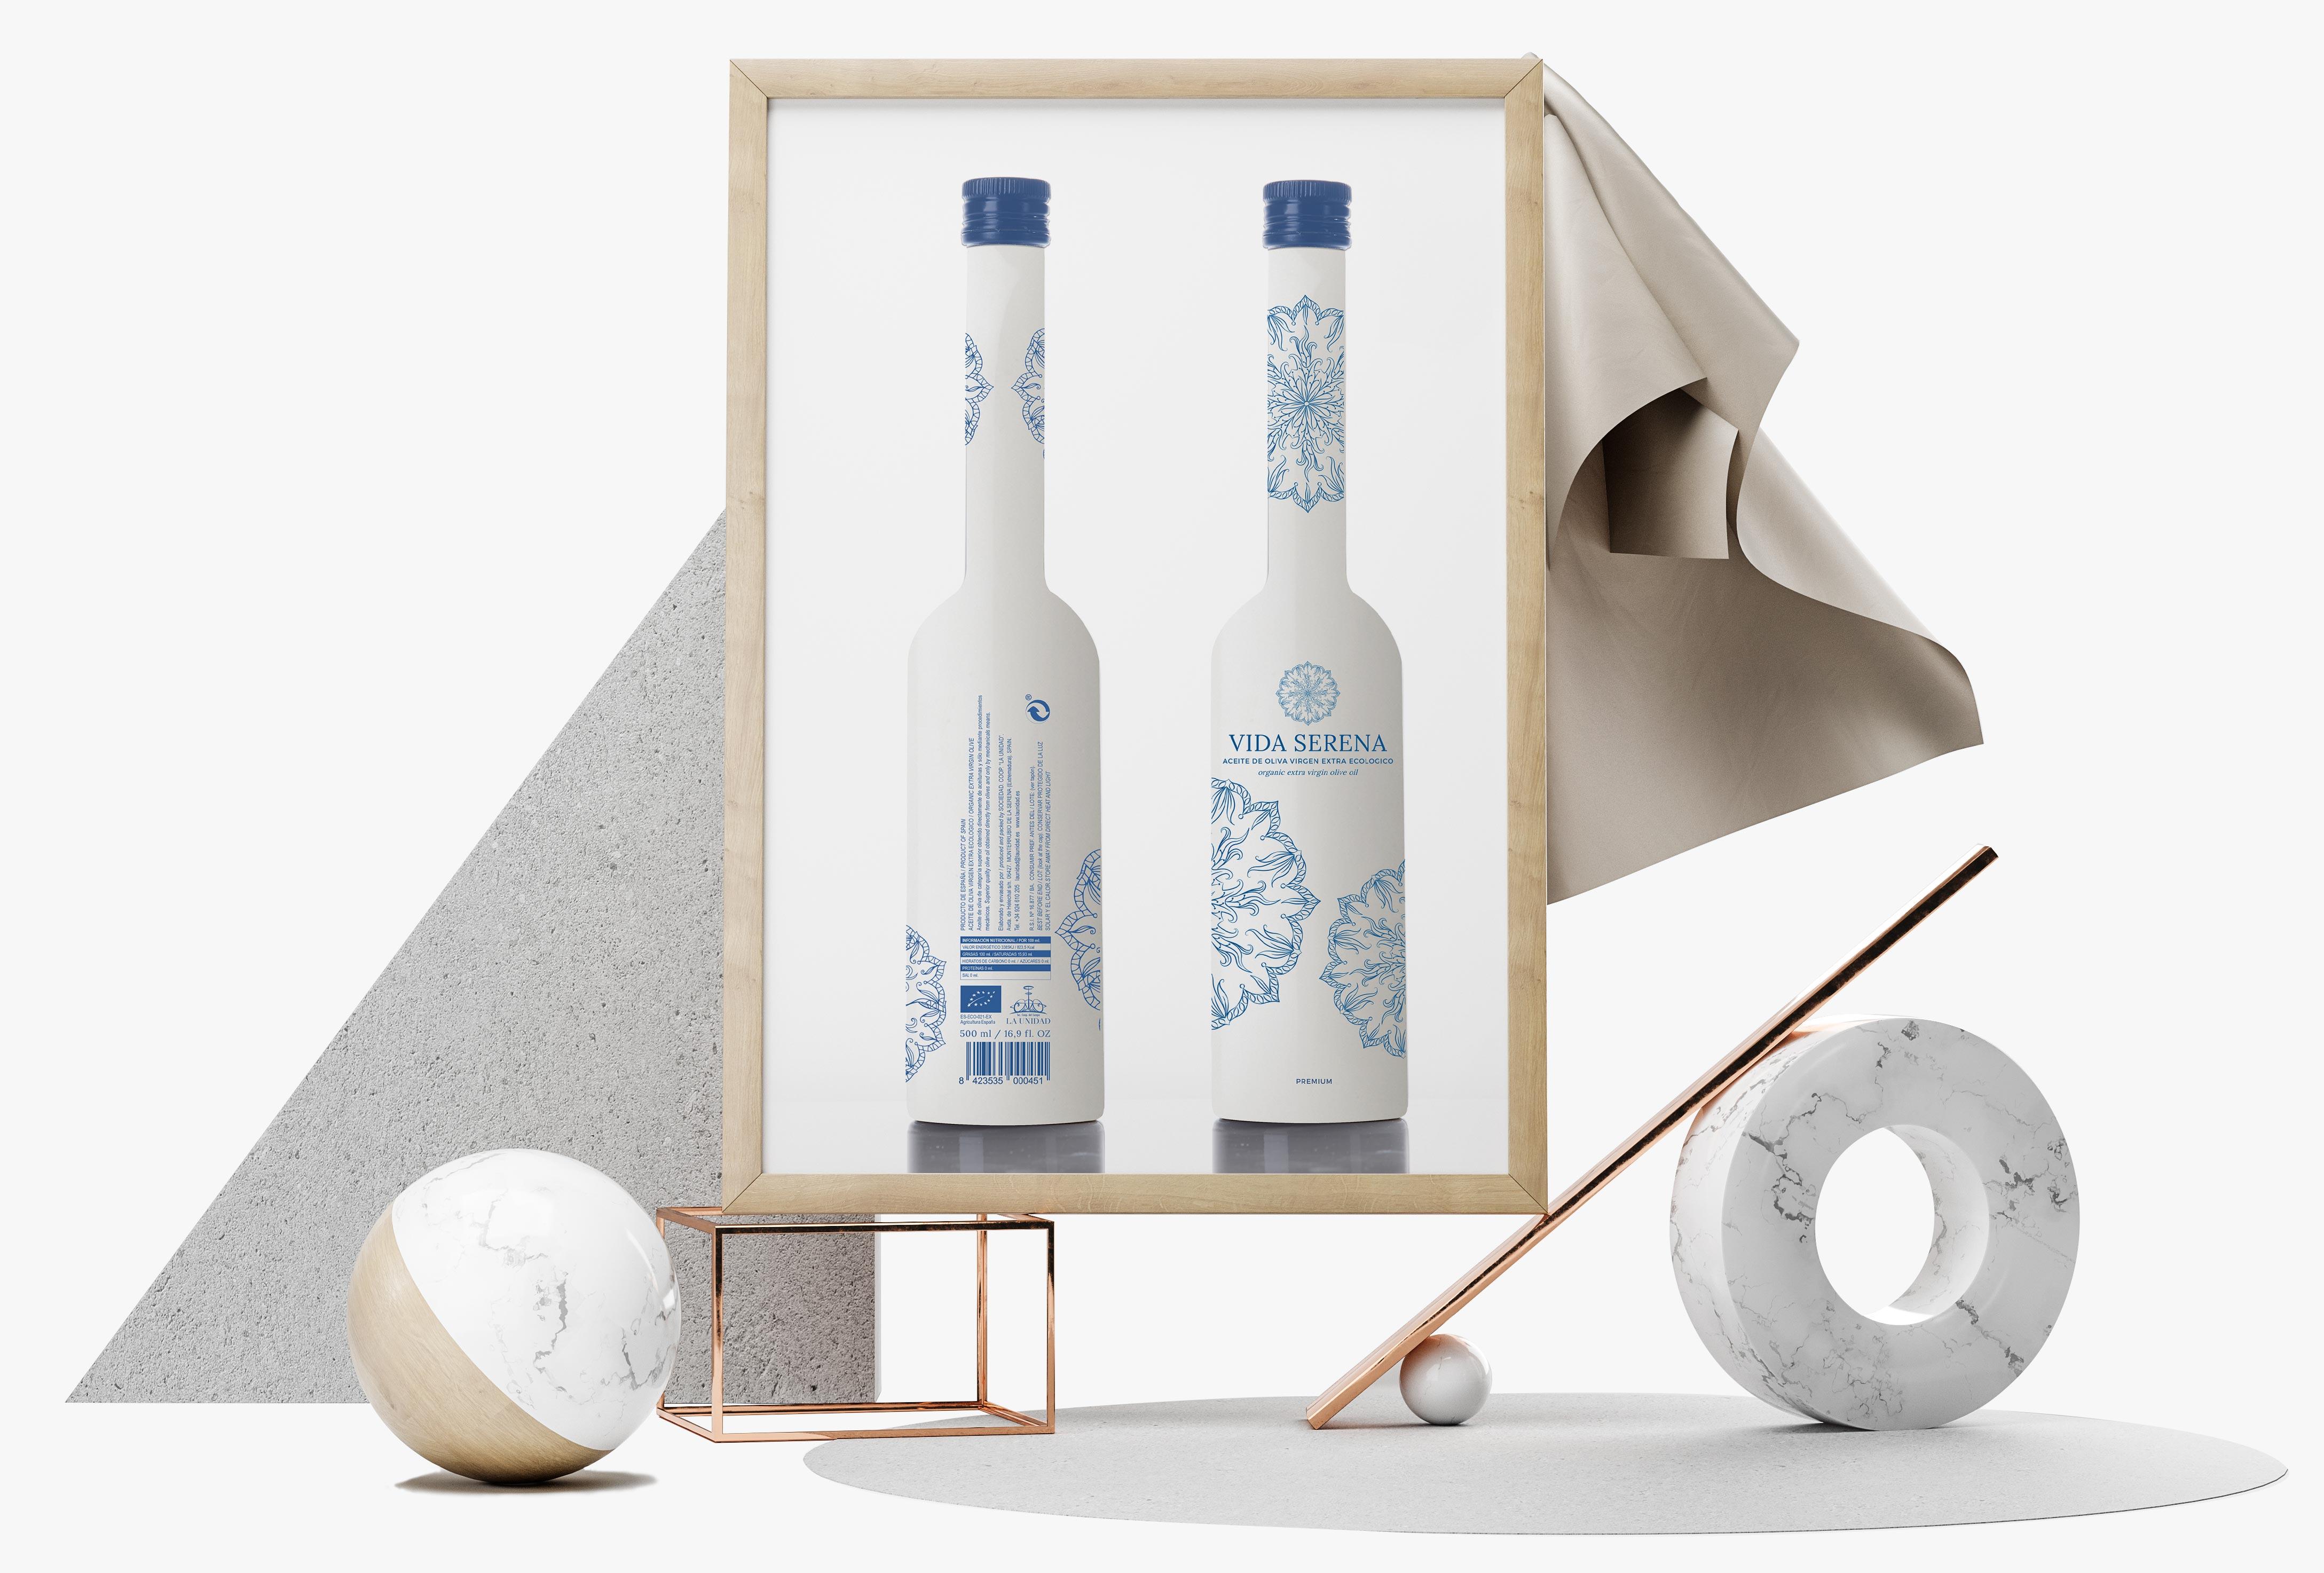 Diseño de producto, branding, packagin...i love design